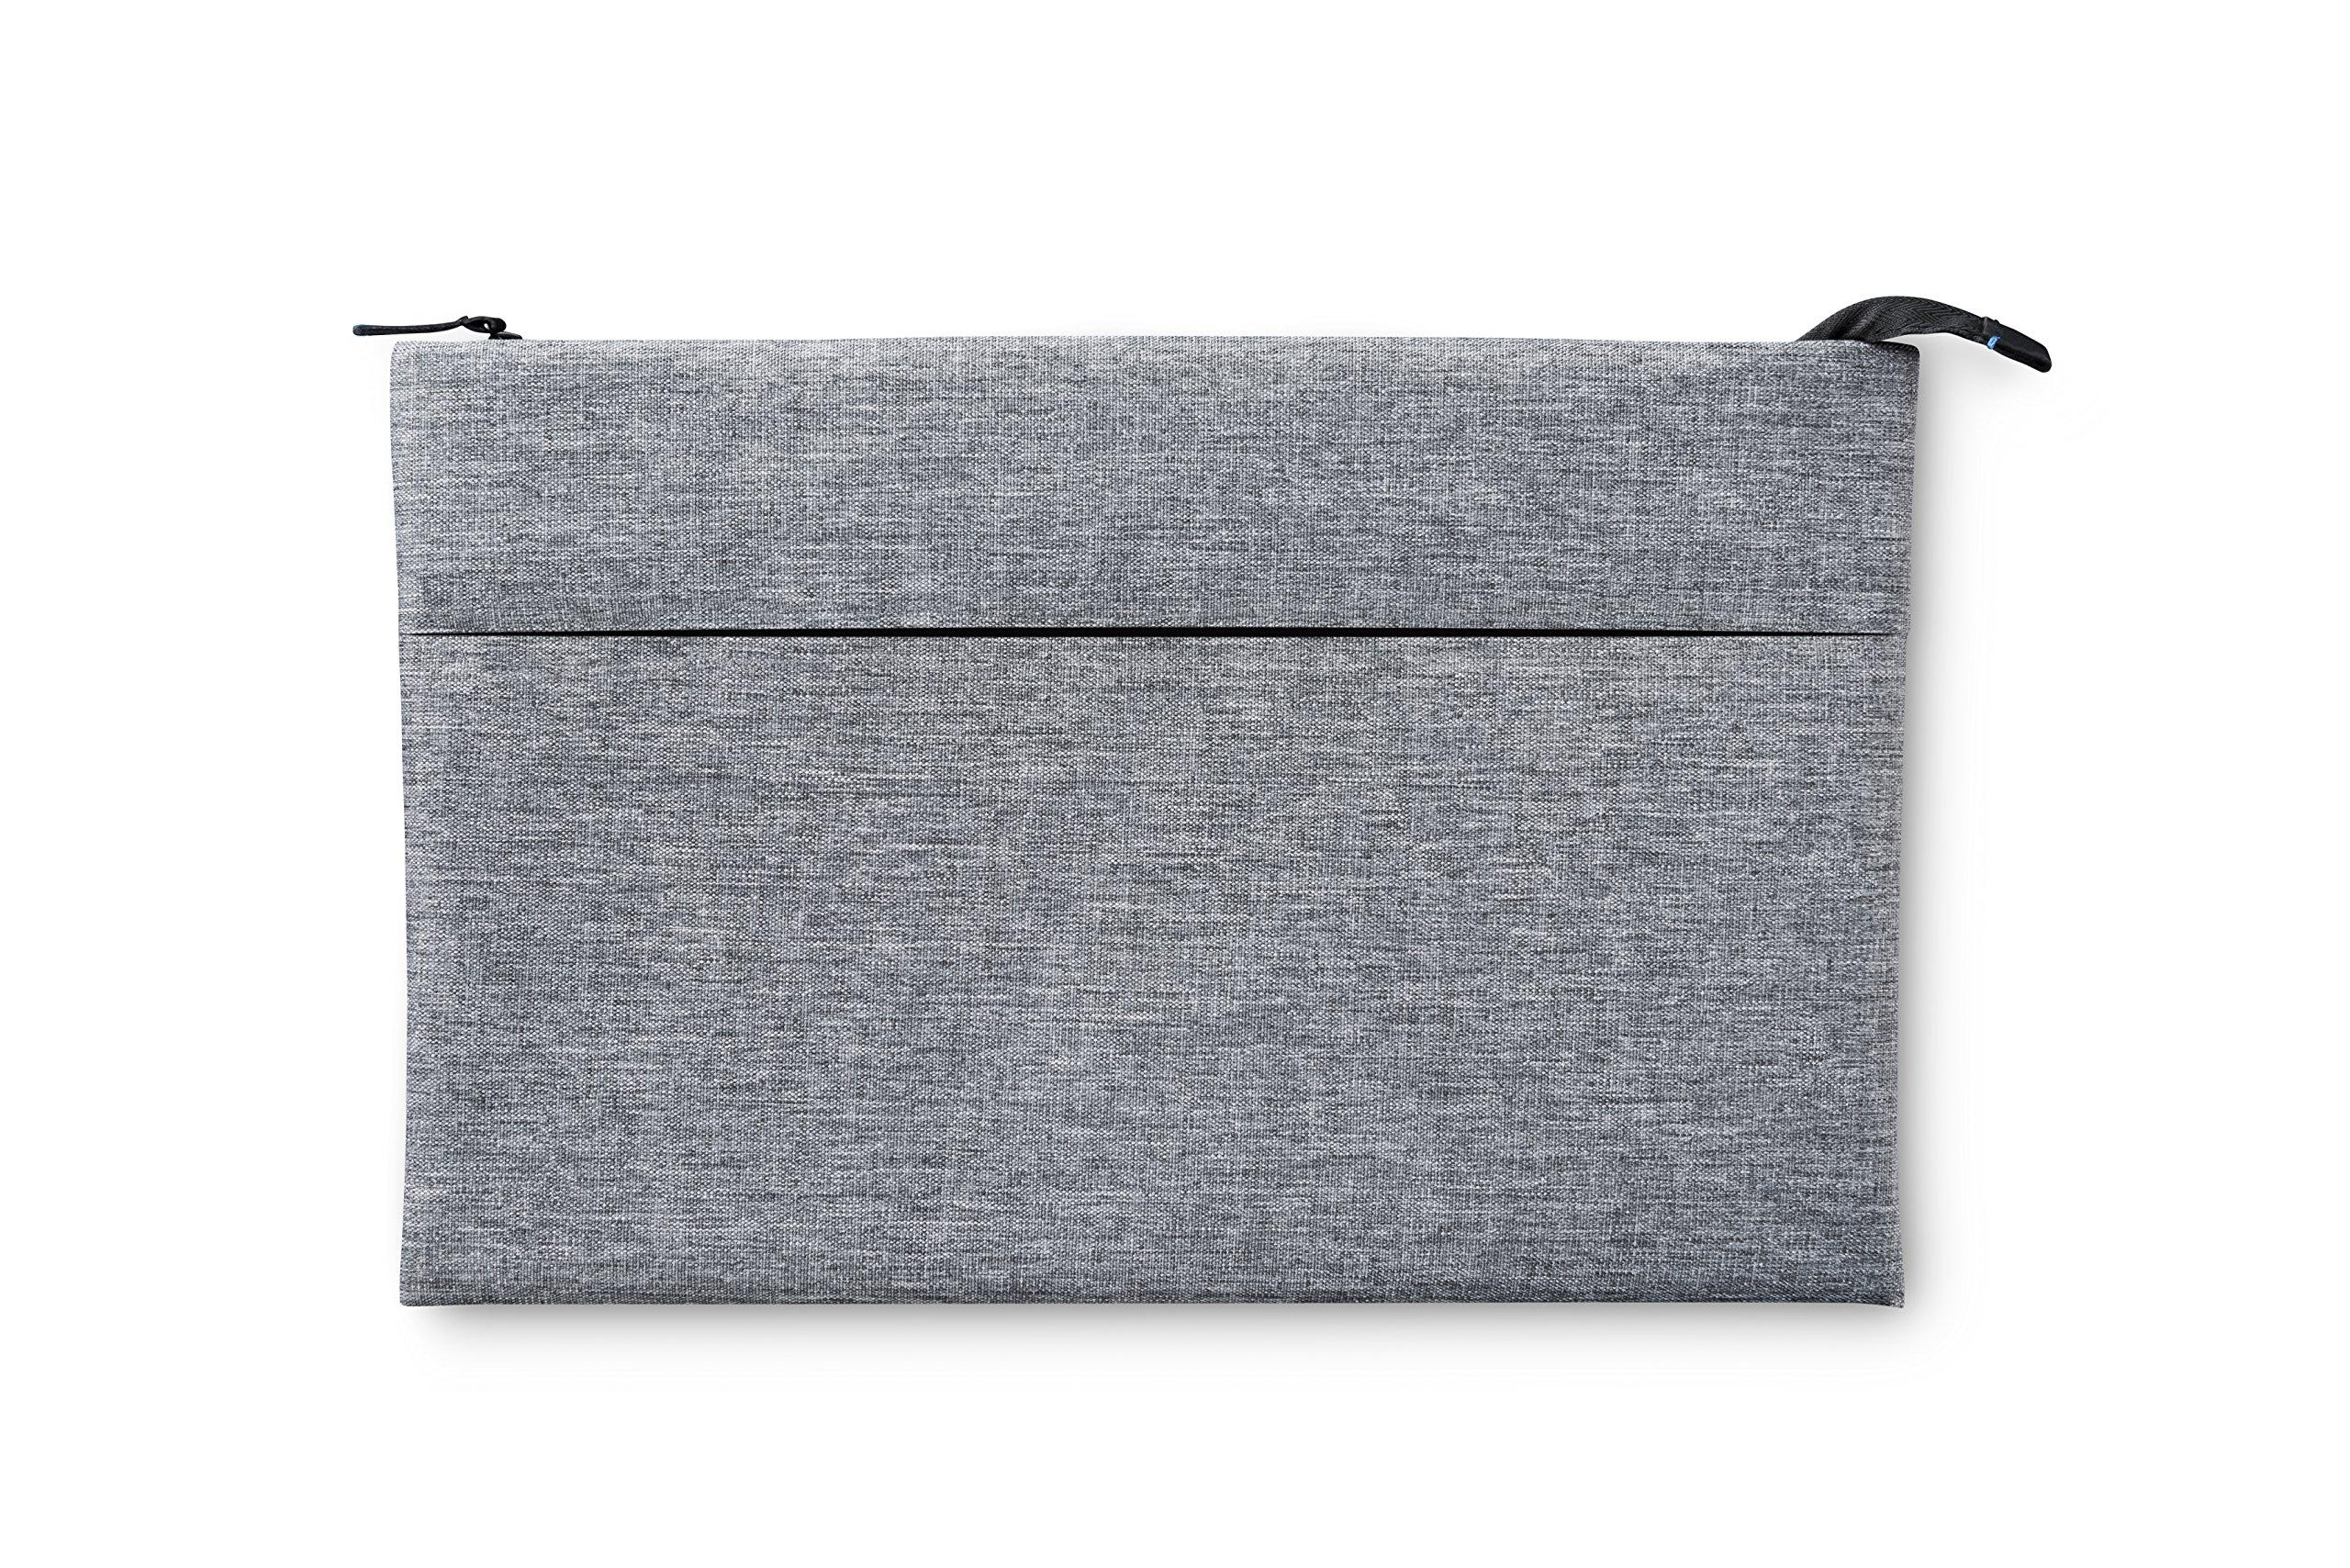 Wacom ACK52701 Soft Tablet Case, Medium, For Intuos Pro, Cintiq Pro or MobileStudio Pro by Wacom (Image #3)